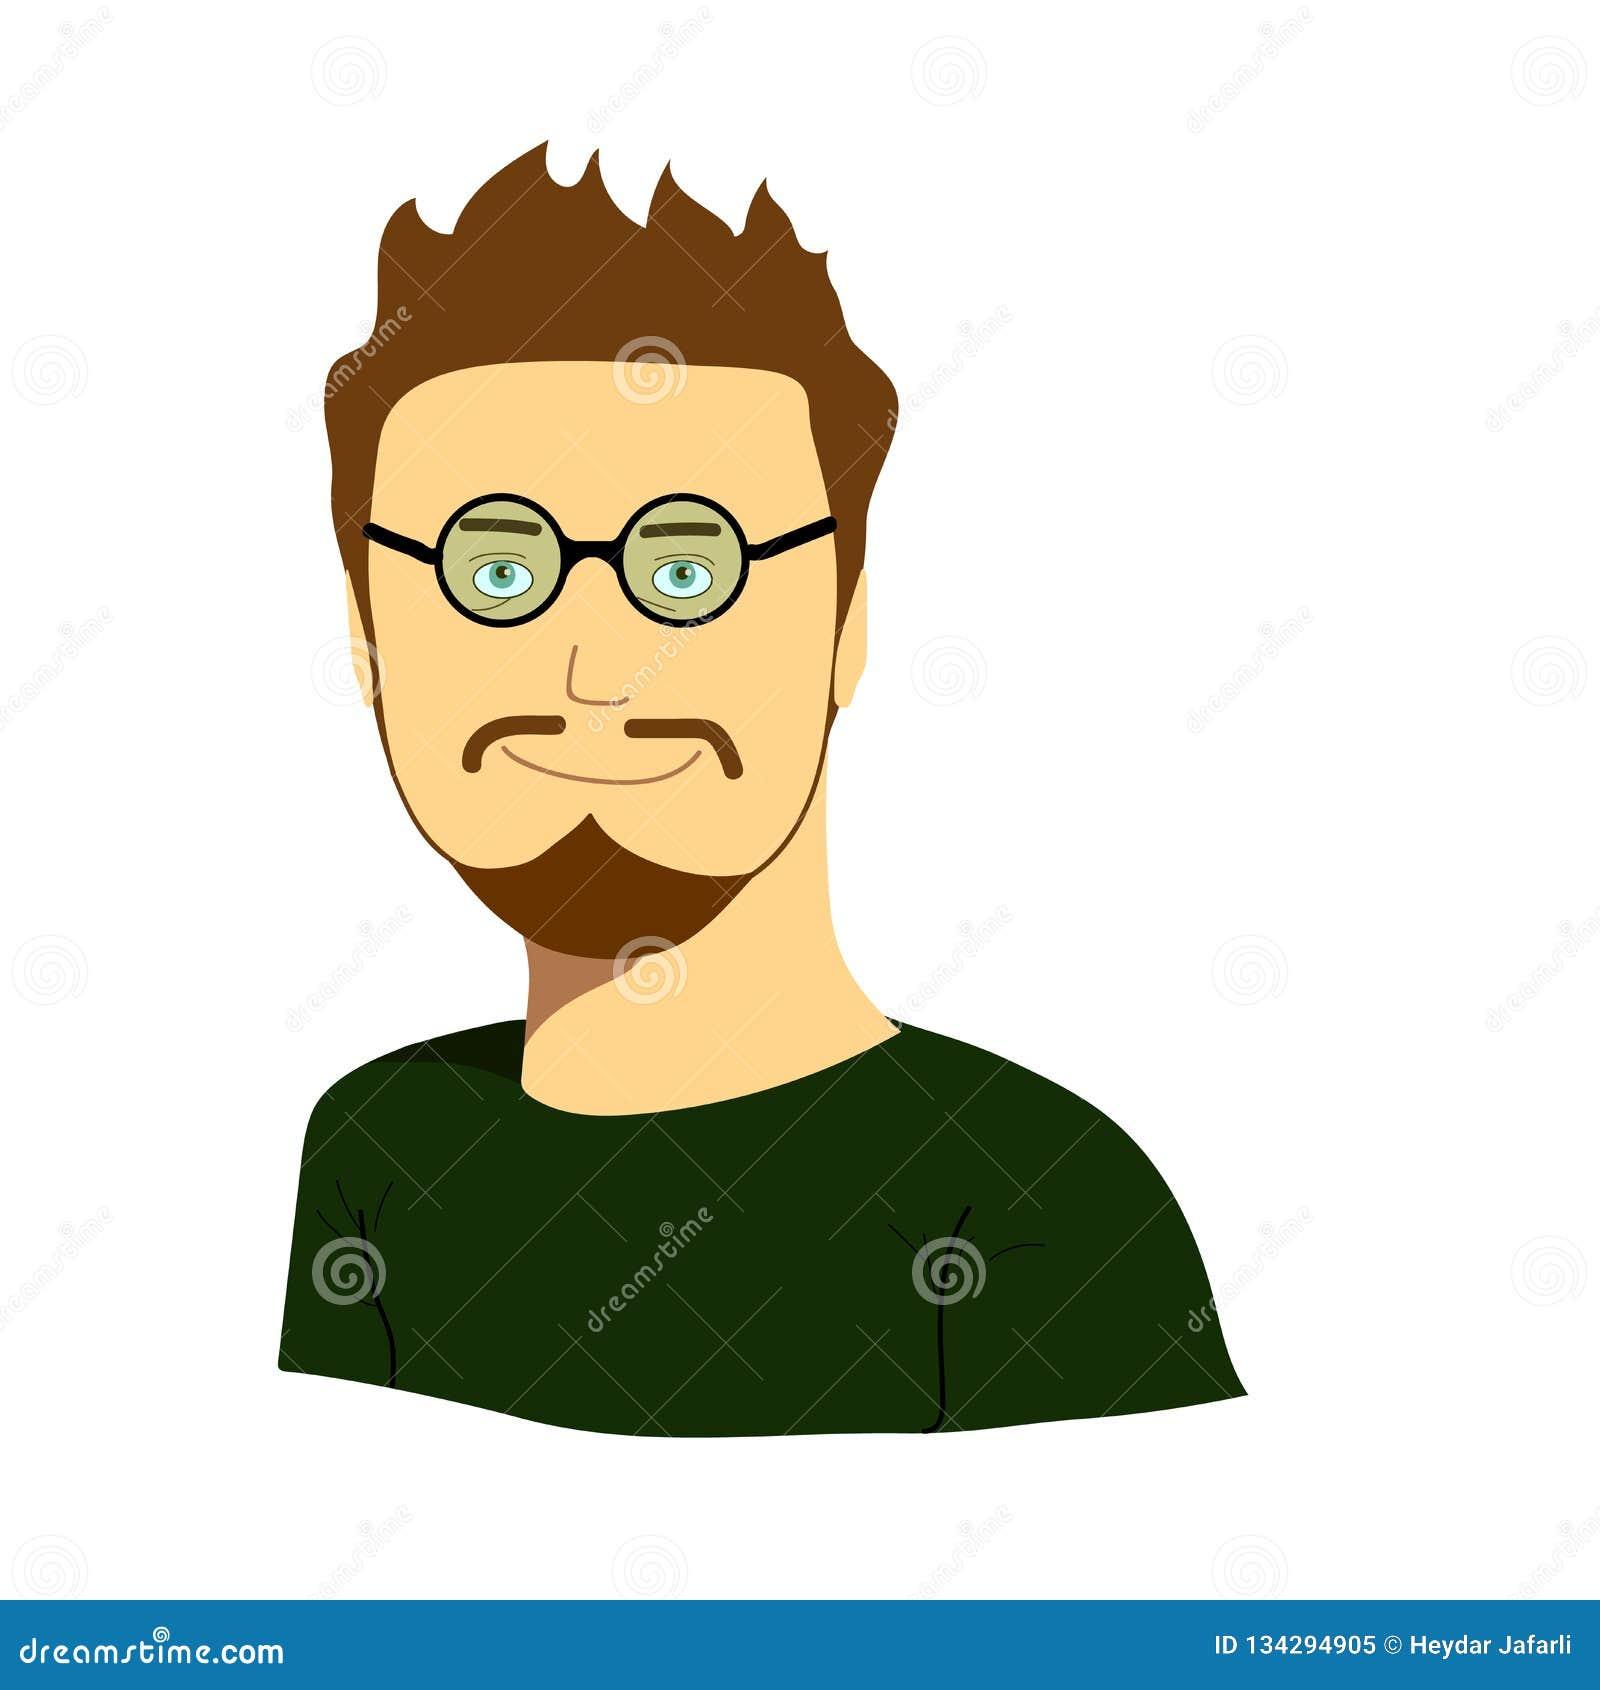 Developer Avatar: Male IT Programmer Accessing Internet On Laptop Cartoon